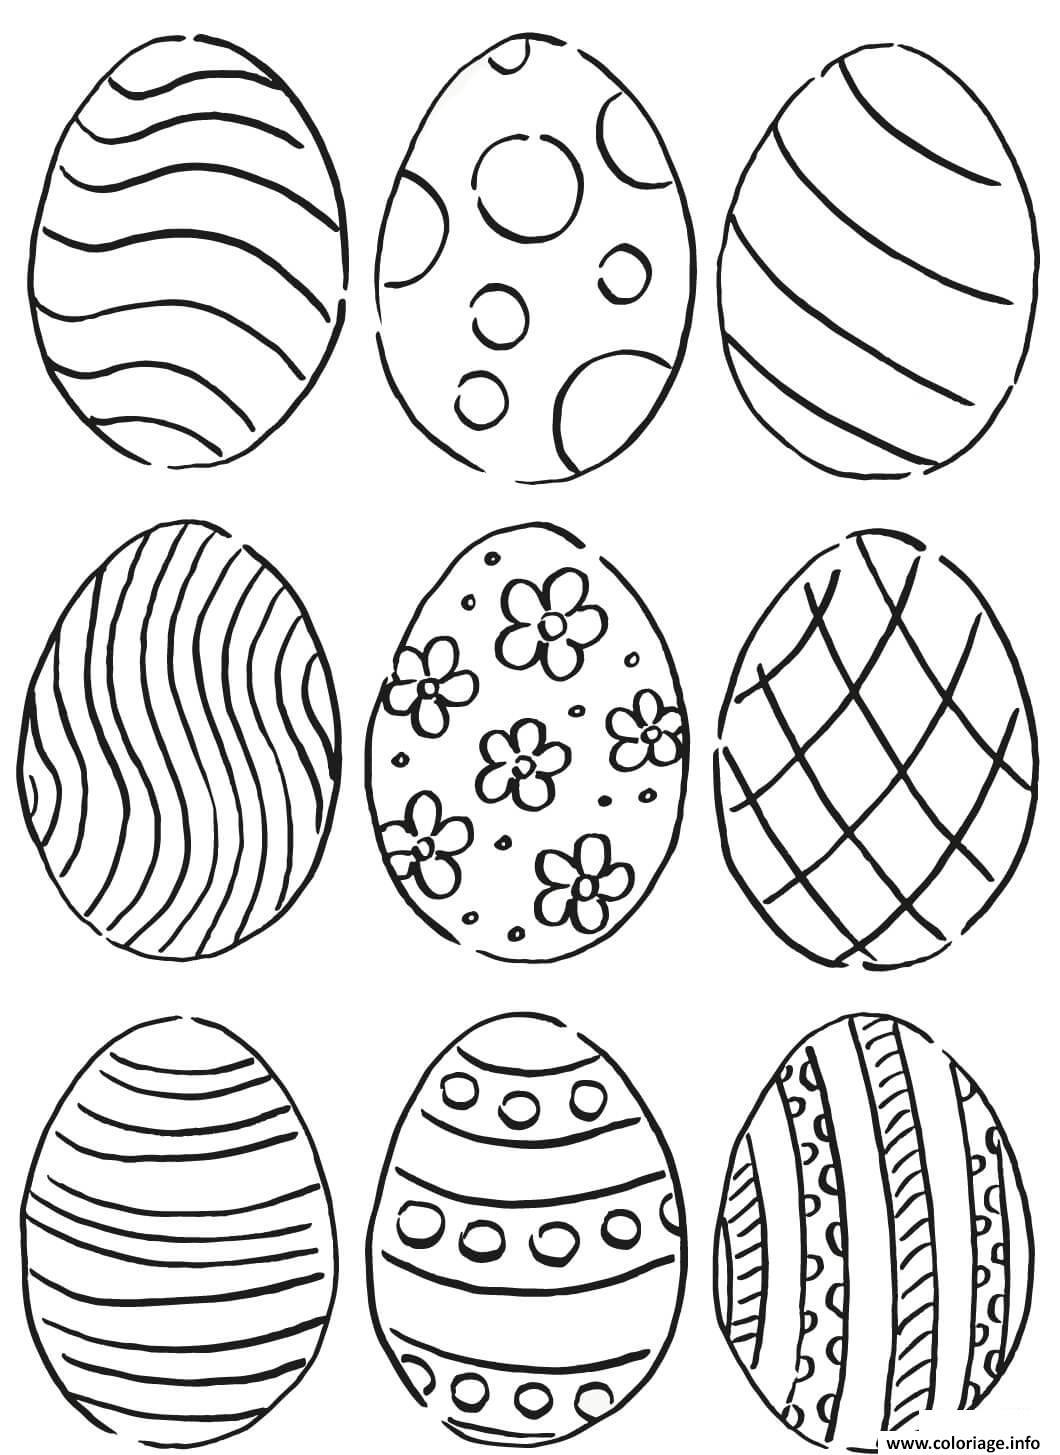 Coloriage Oeuf De Paquess Pattern Dessin